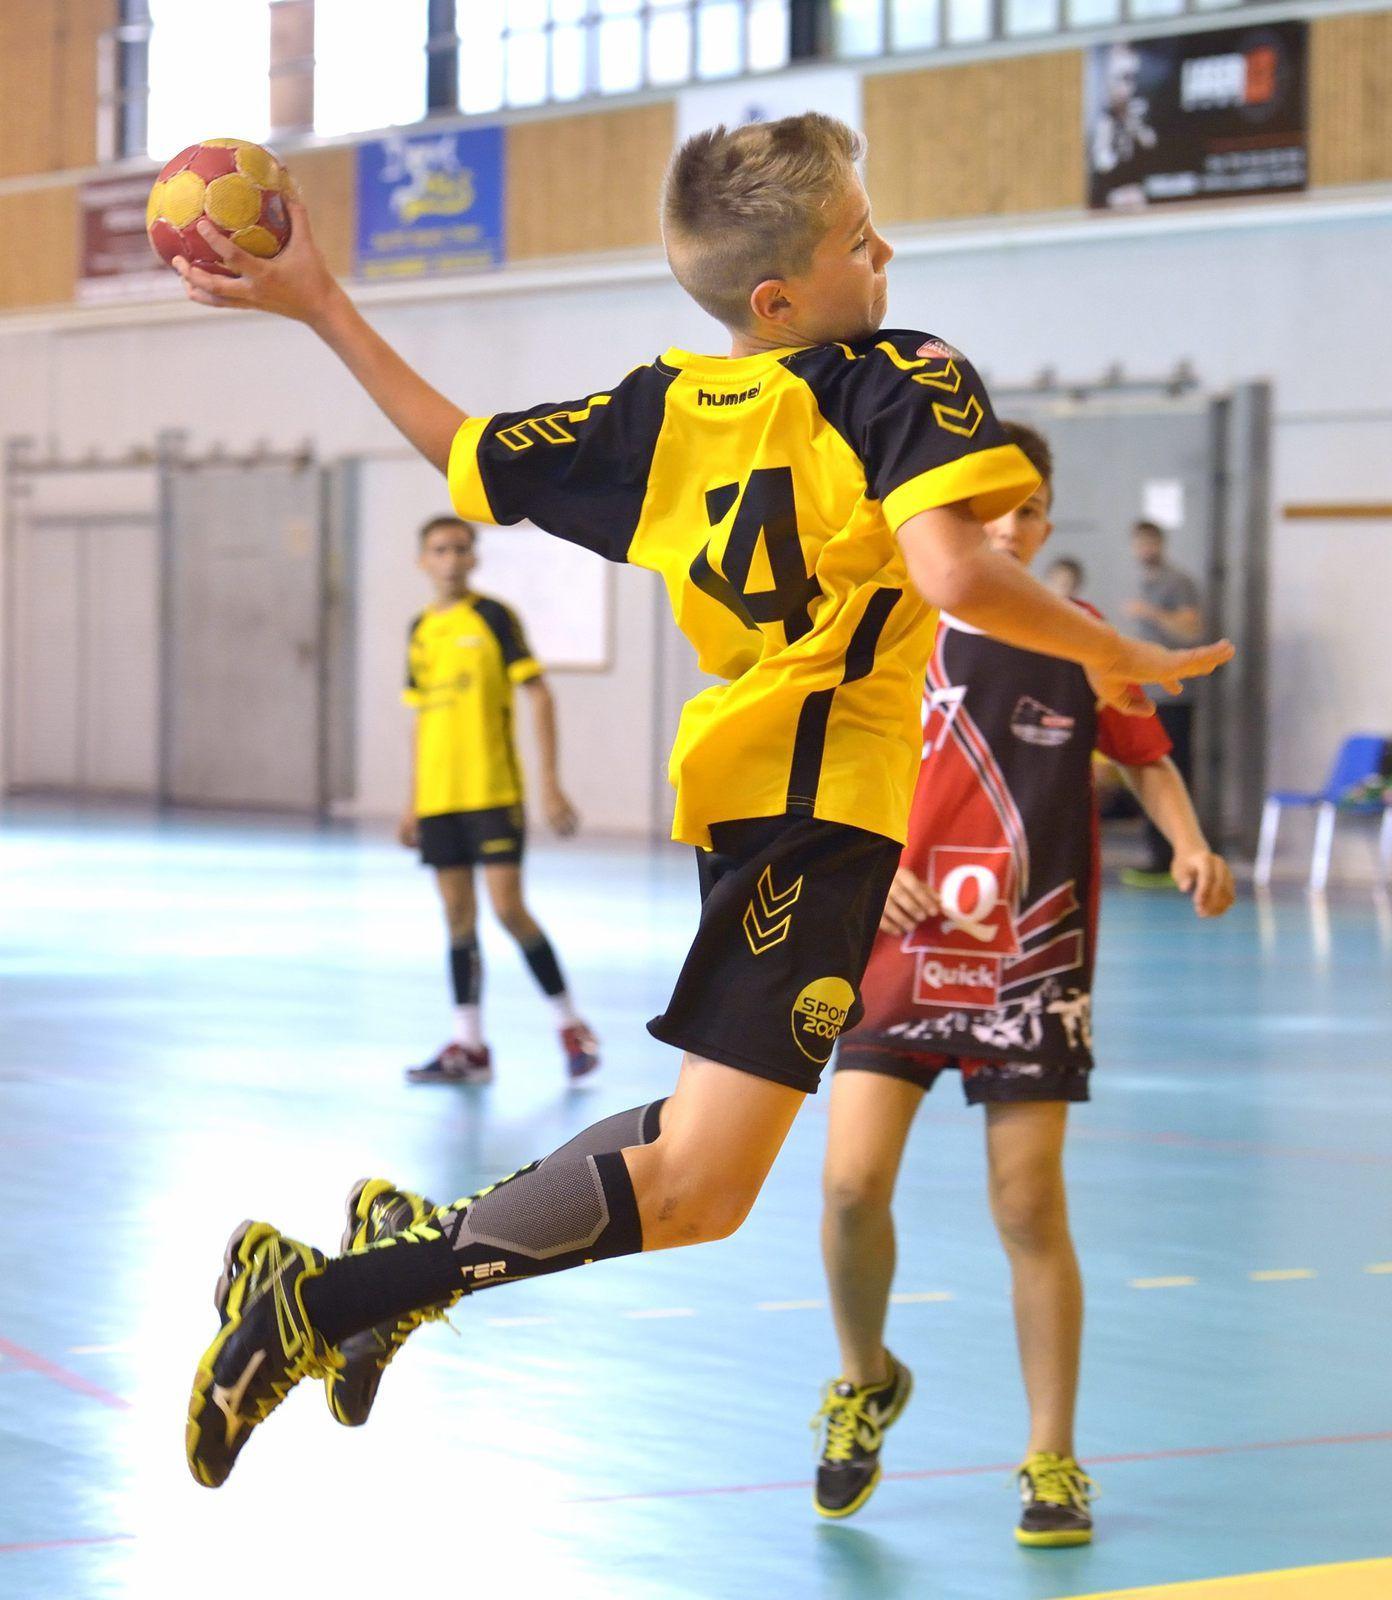 Photos : Jean Pierre RIBOLI / Jean Jaures samedi 18 octobre 2014